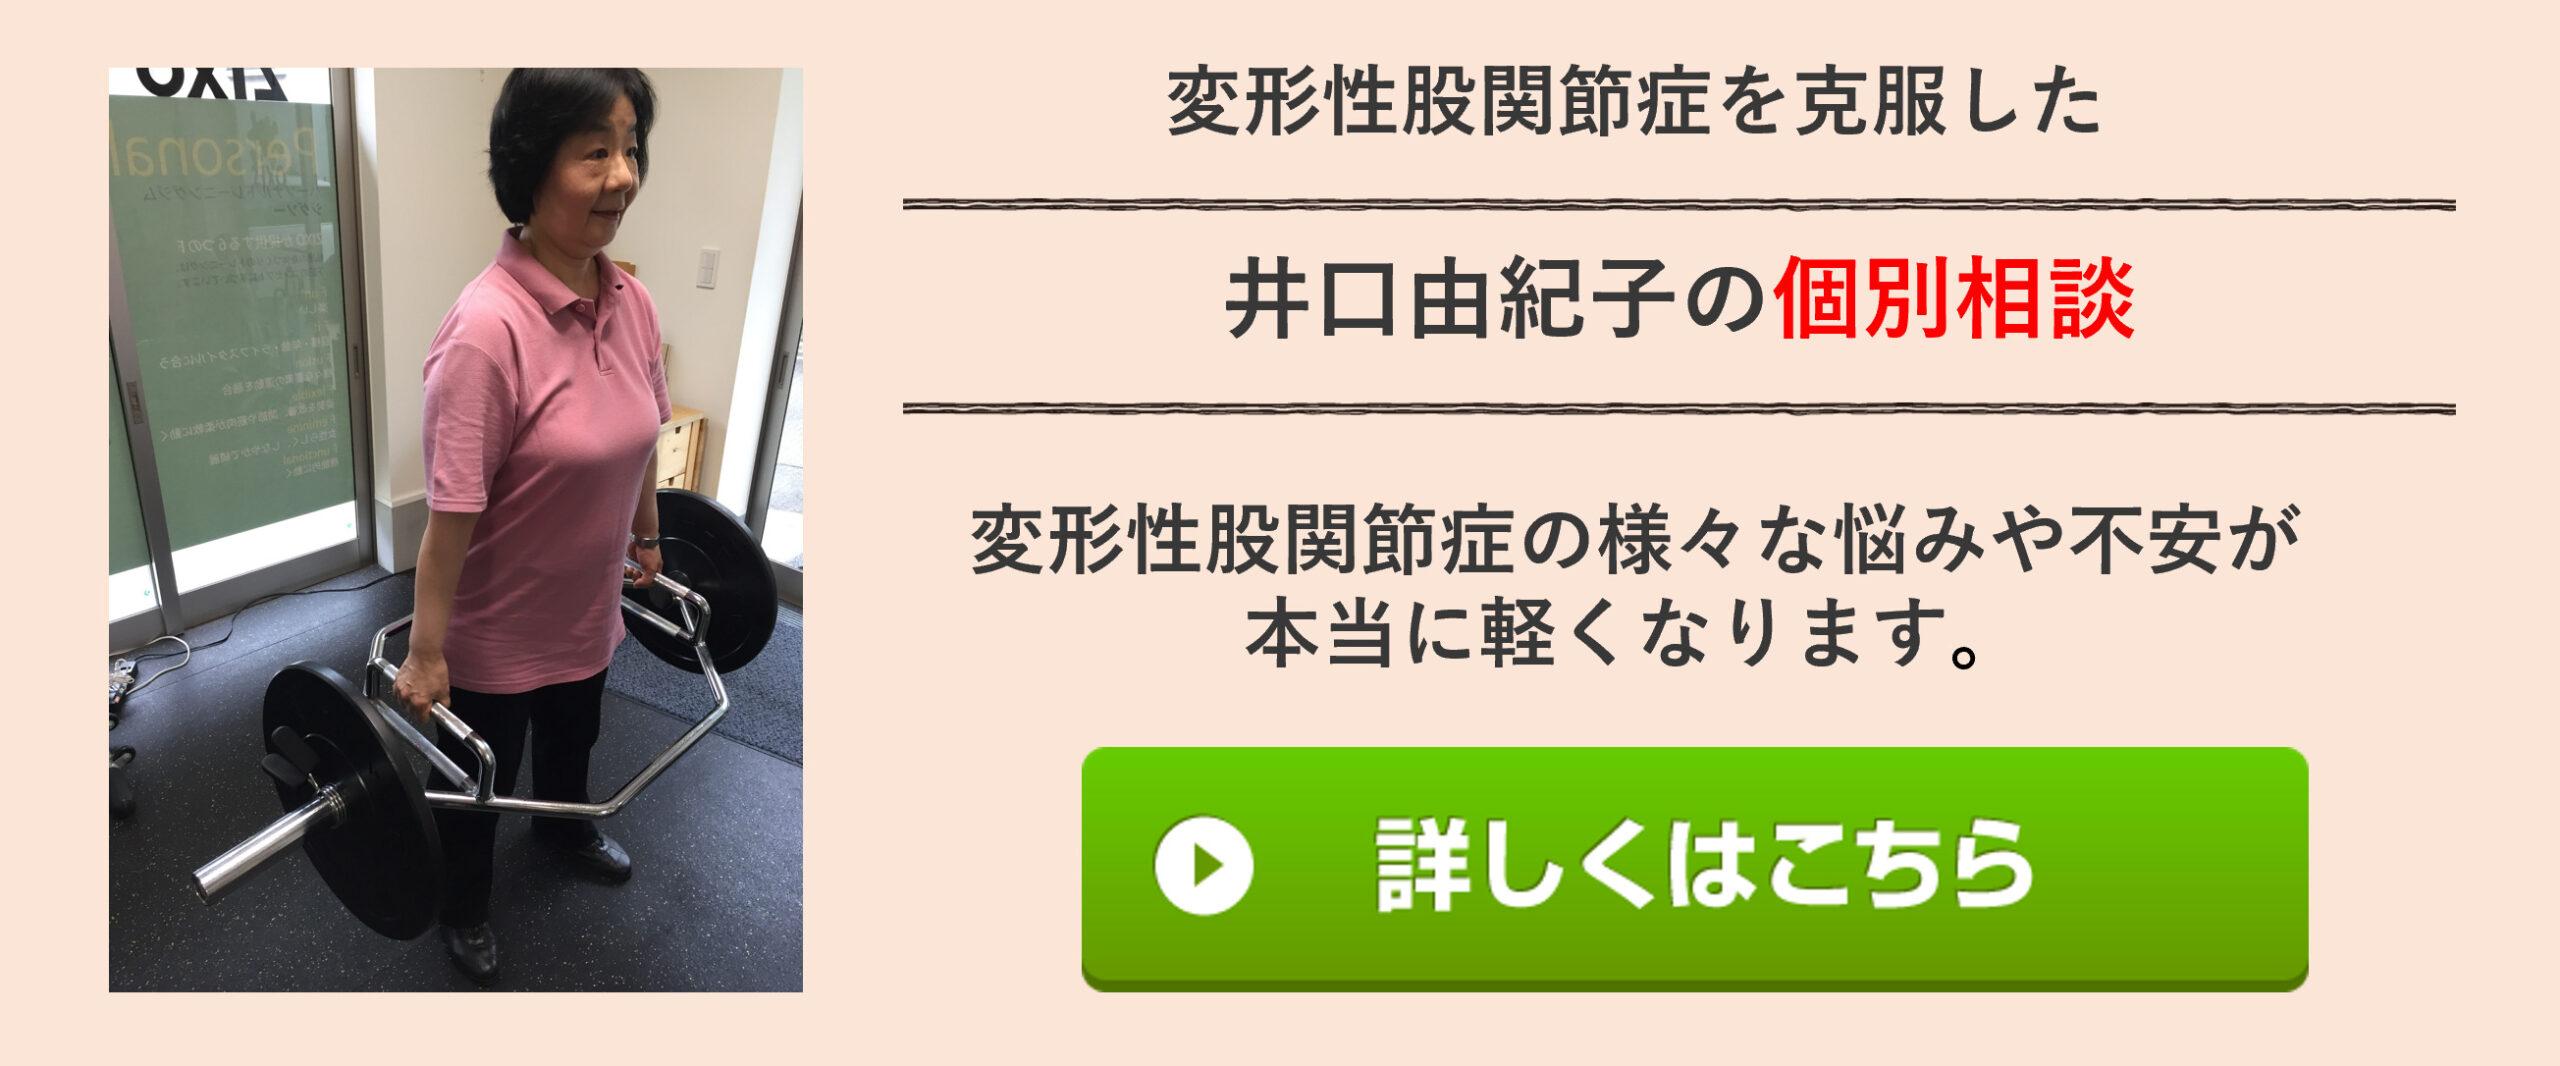 井口由紀子の個別相談